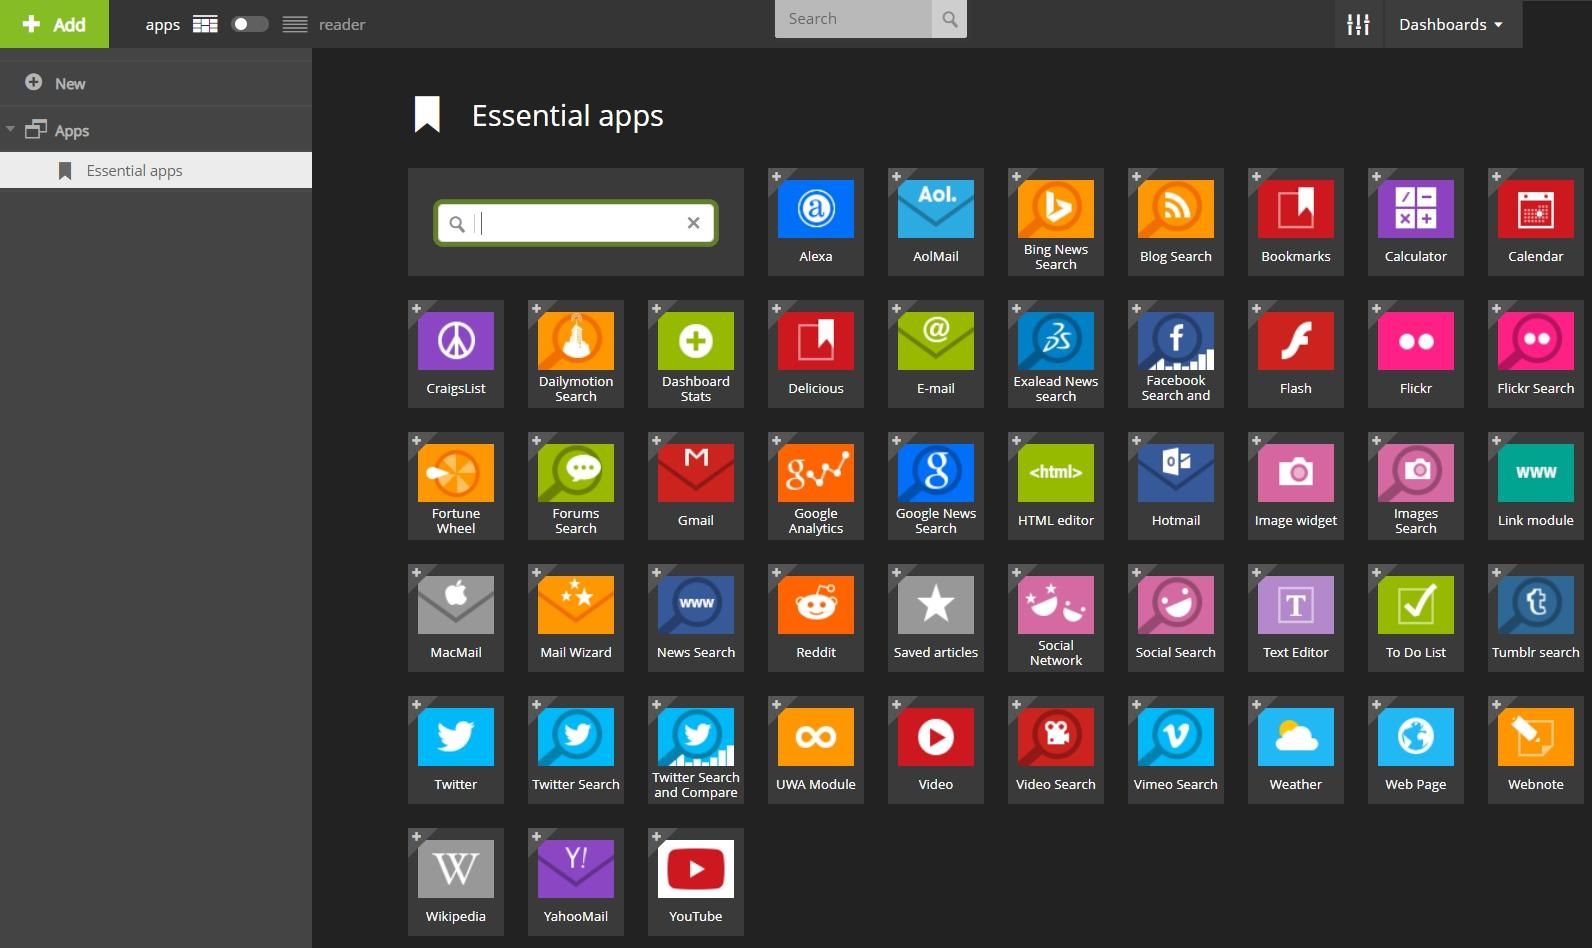 netvibes EssentialApps